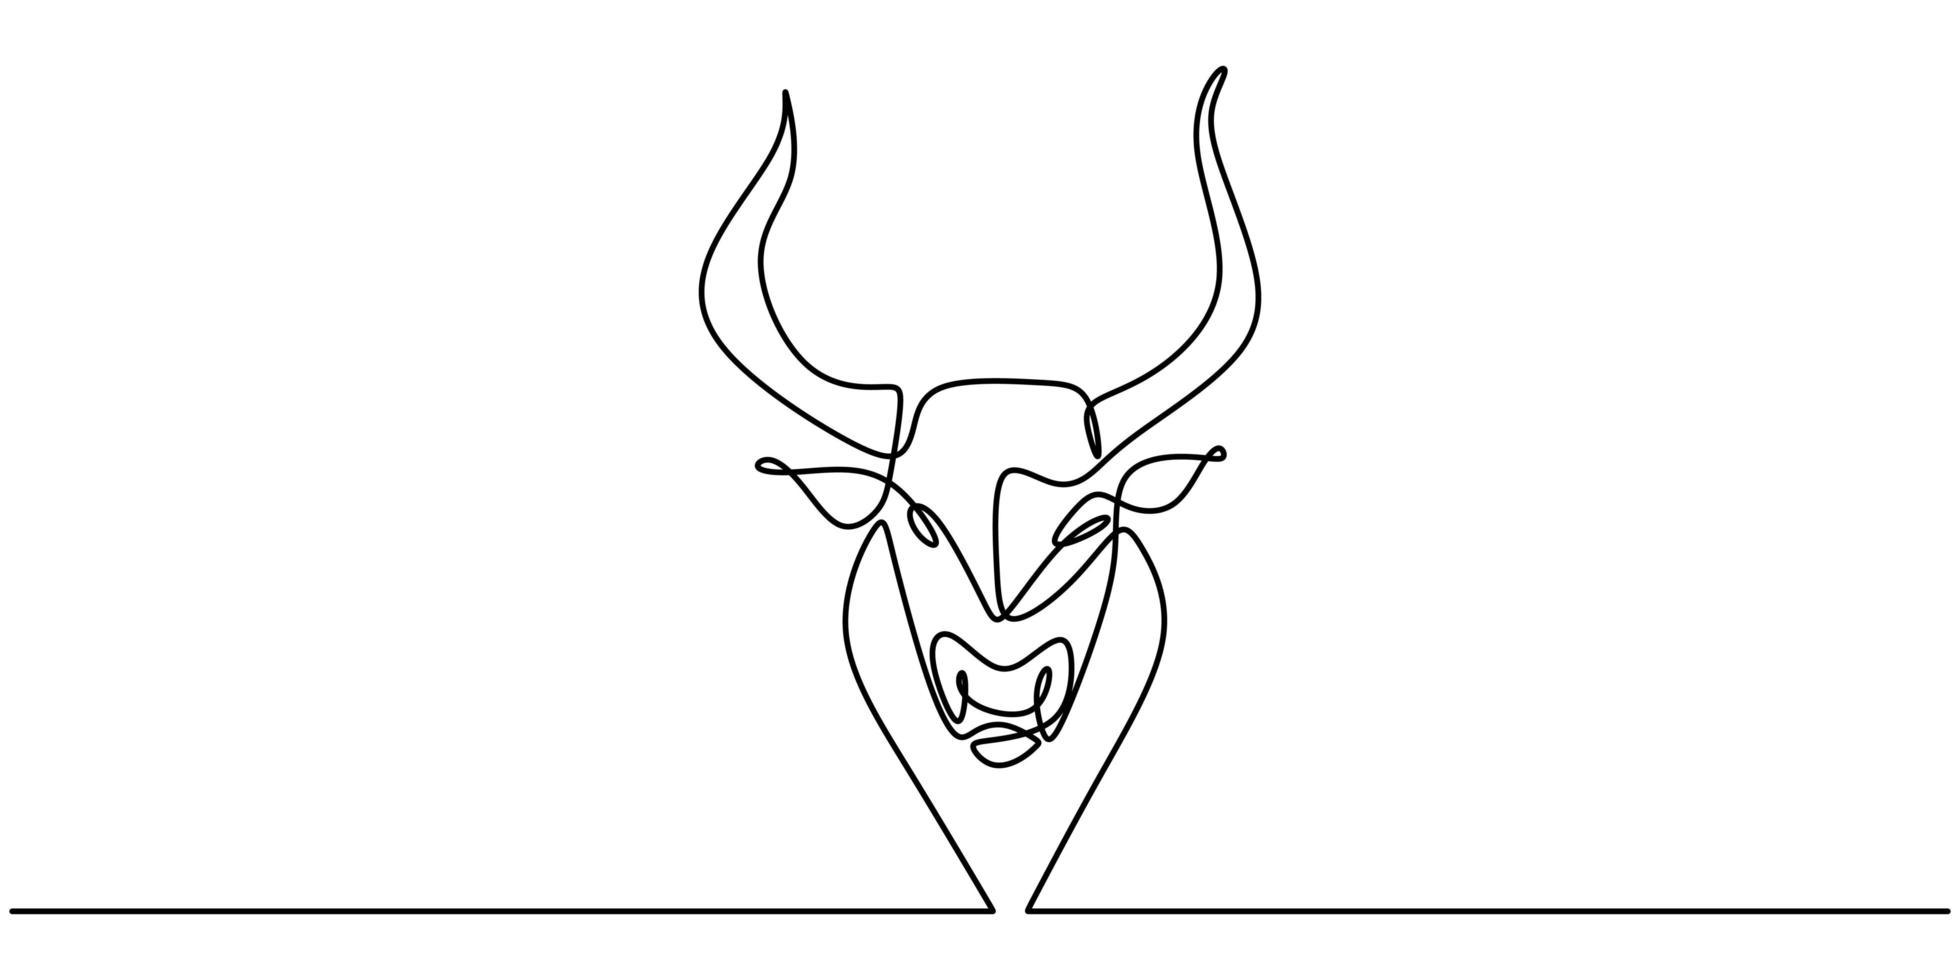 kontinuerlig en linje ritning tjur ko. bevarande av hotade djur nationalpark. vektor